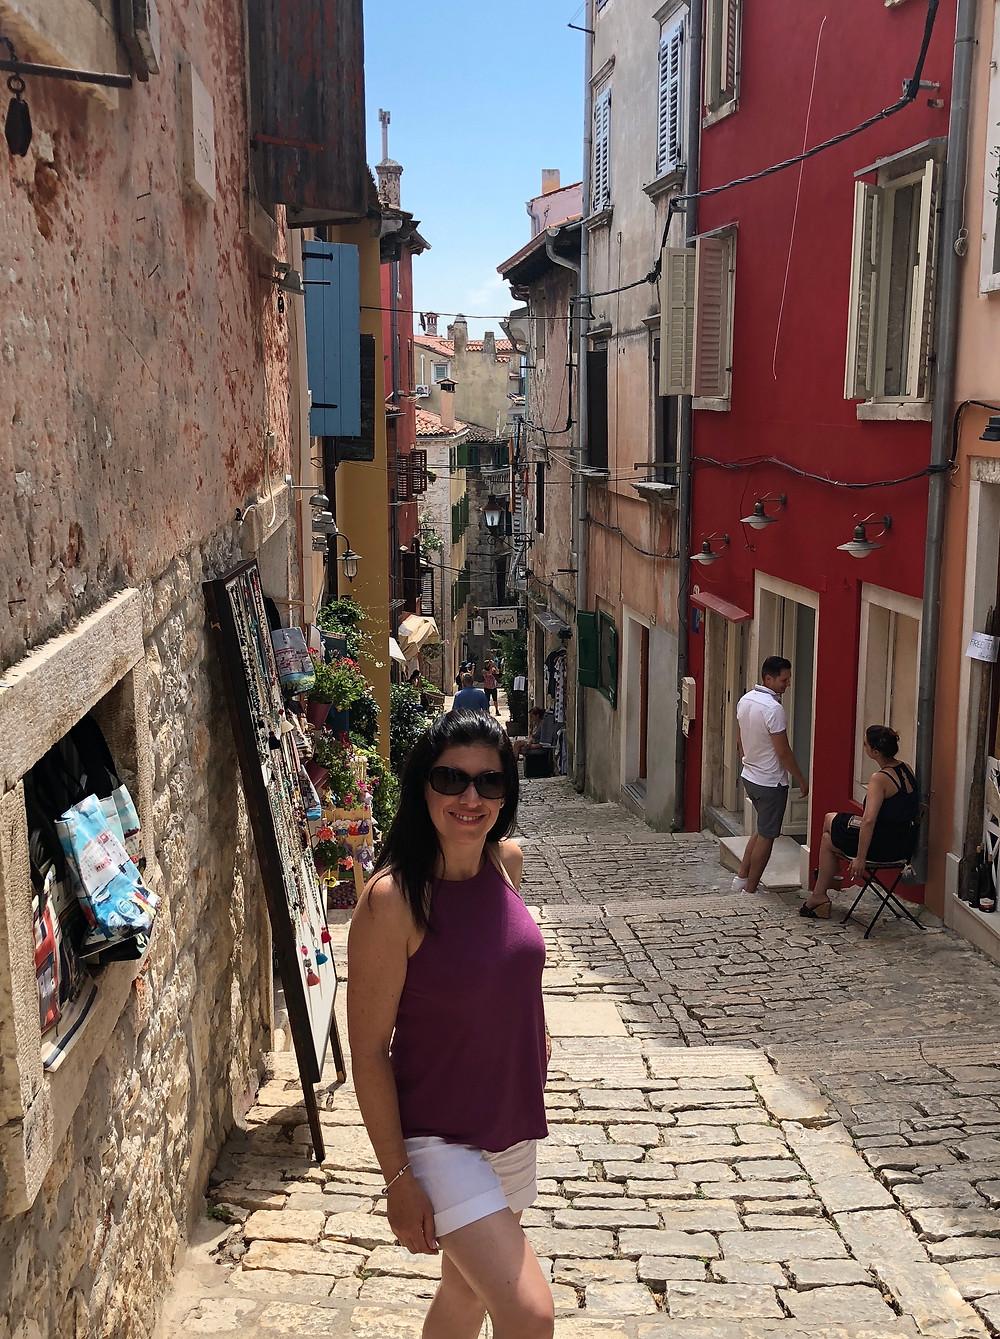 Cobblestone streets of Rovinj, northern Croatia